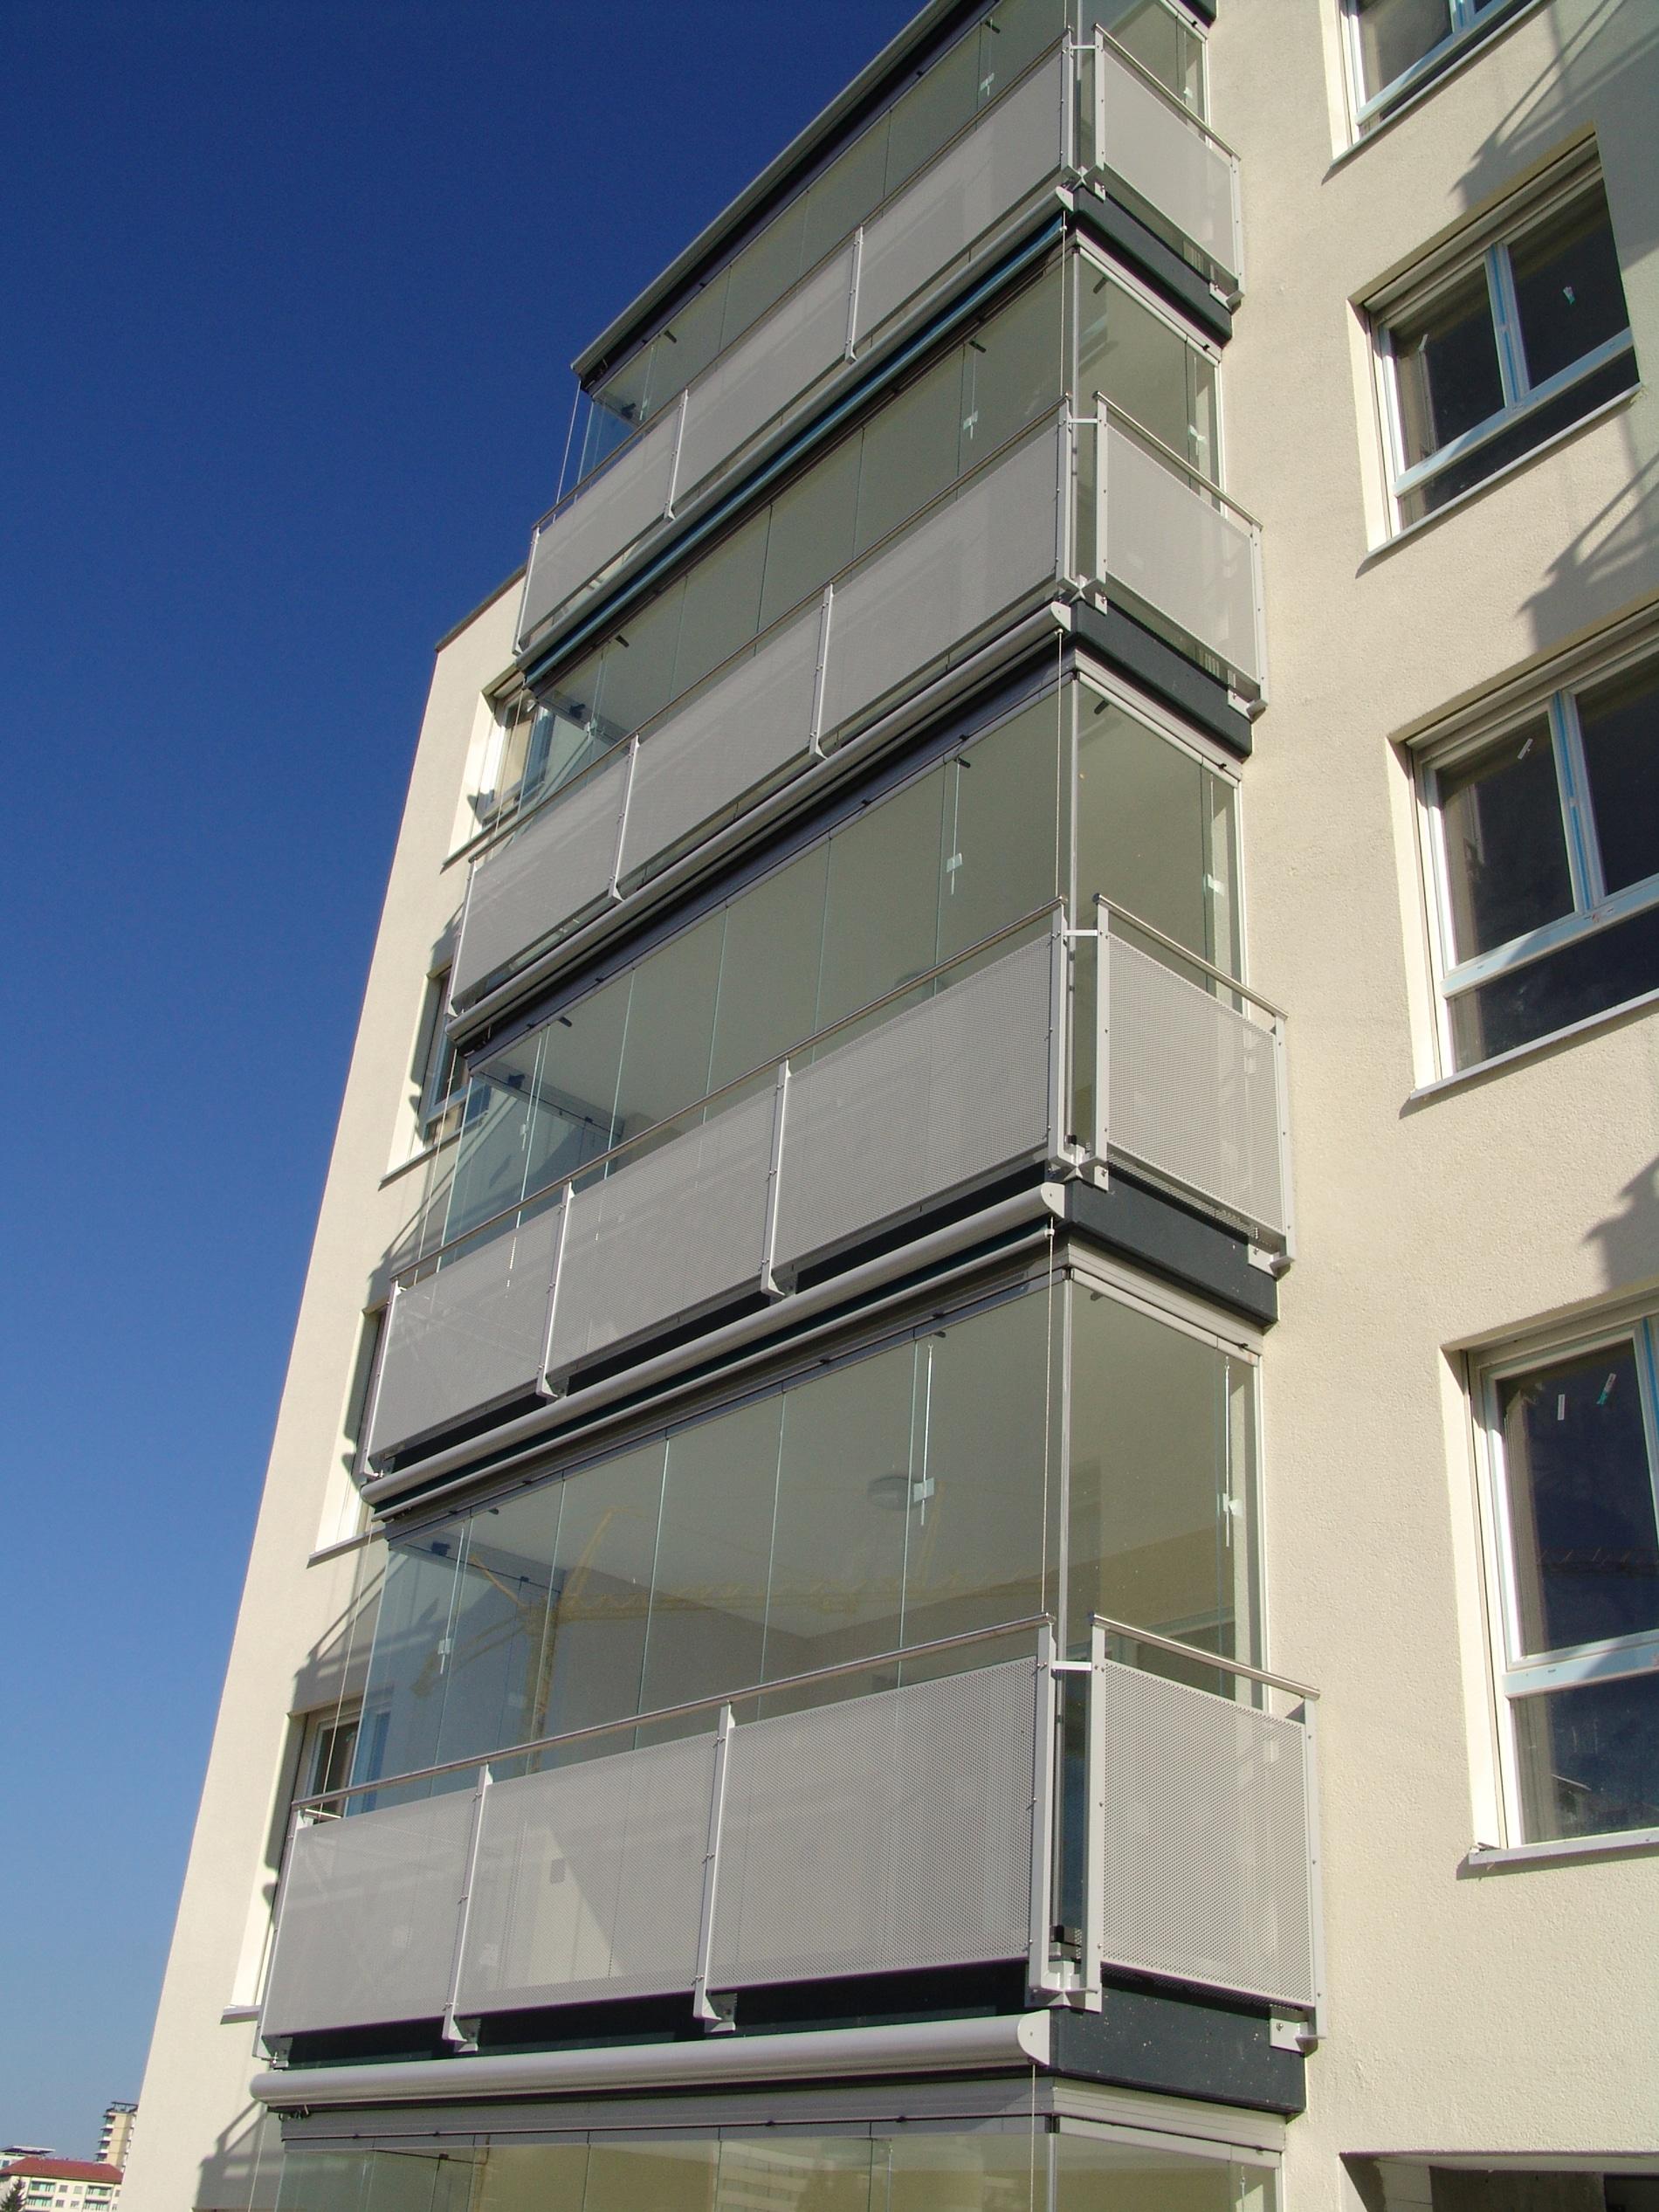 Glasschiebewand Balkon